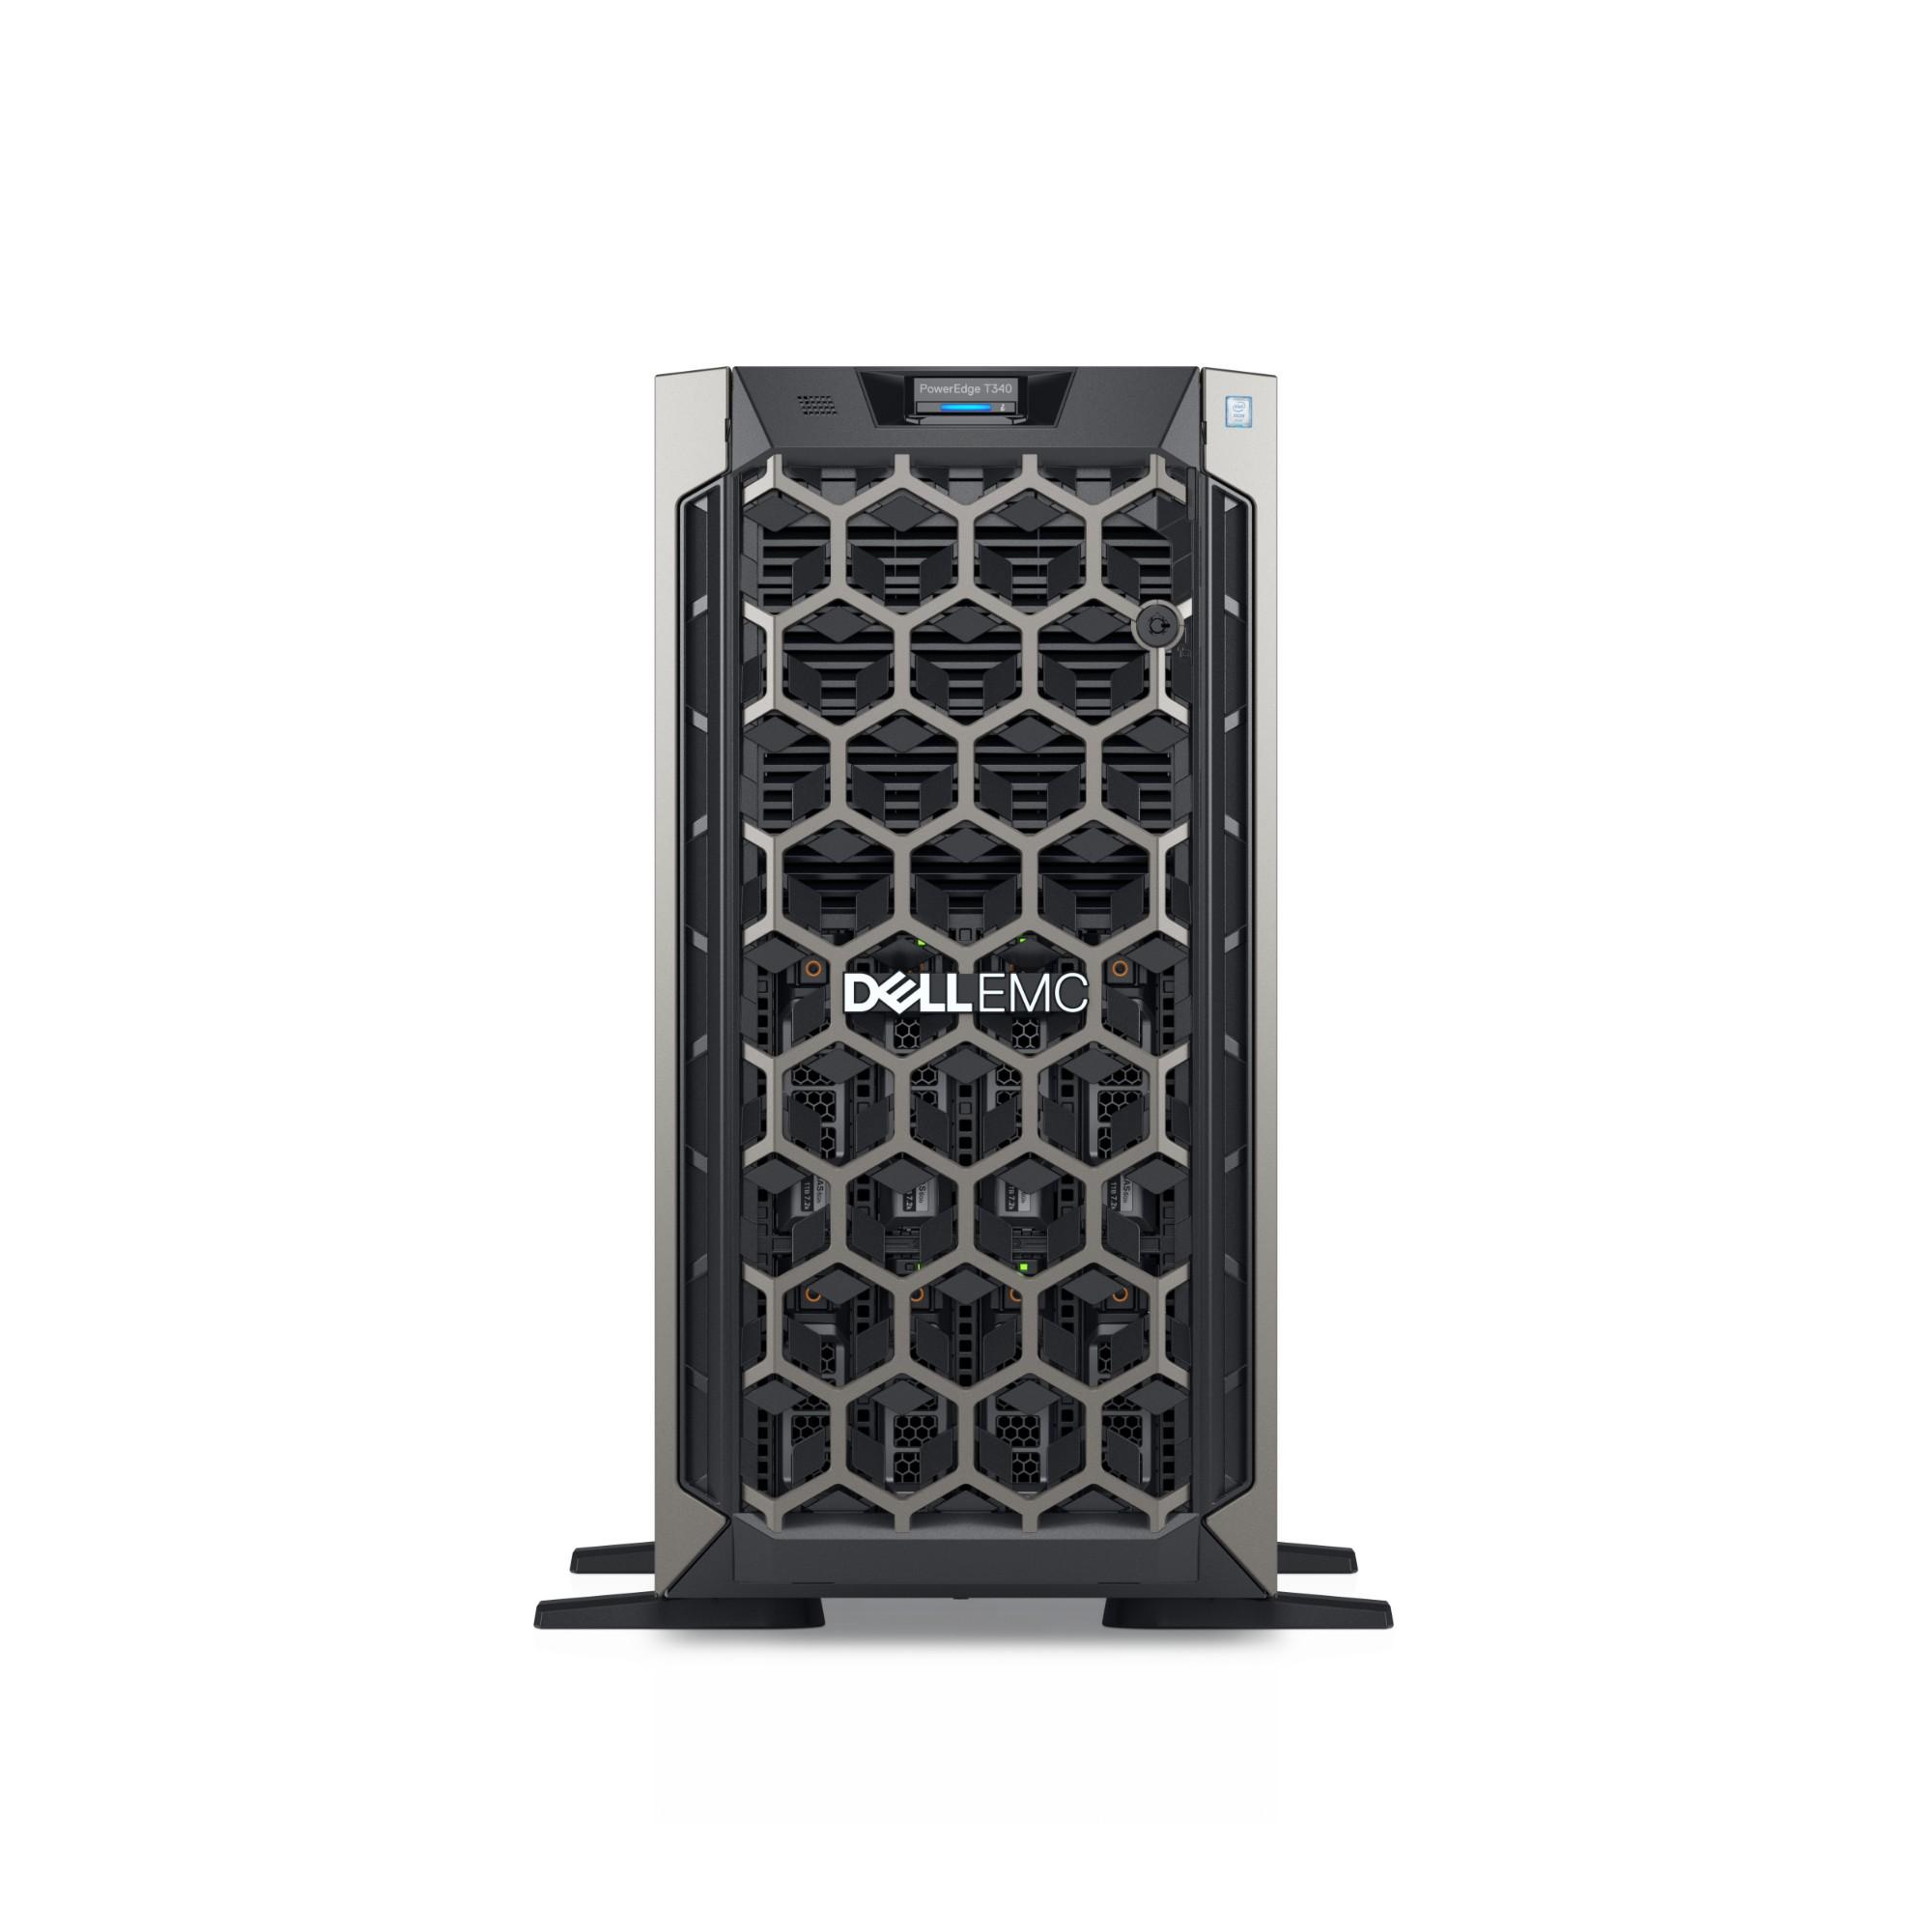 DELL PowerEdge T340 servidor Intel Xeon E 3,6 GHz 16 GB DDR4-SDRAM Tower 495 W